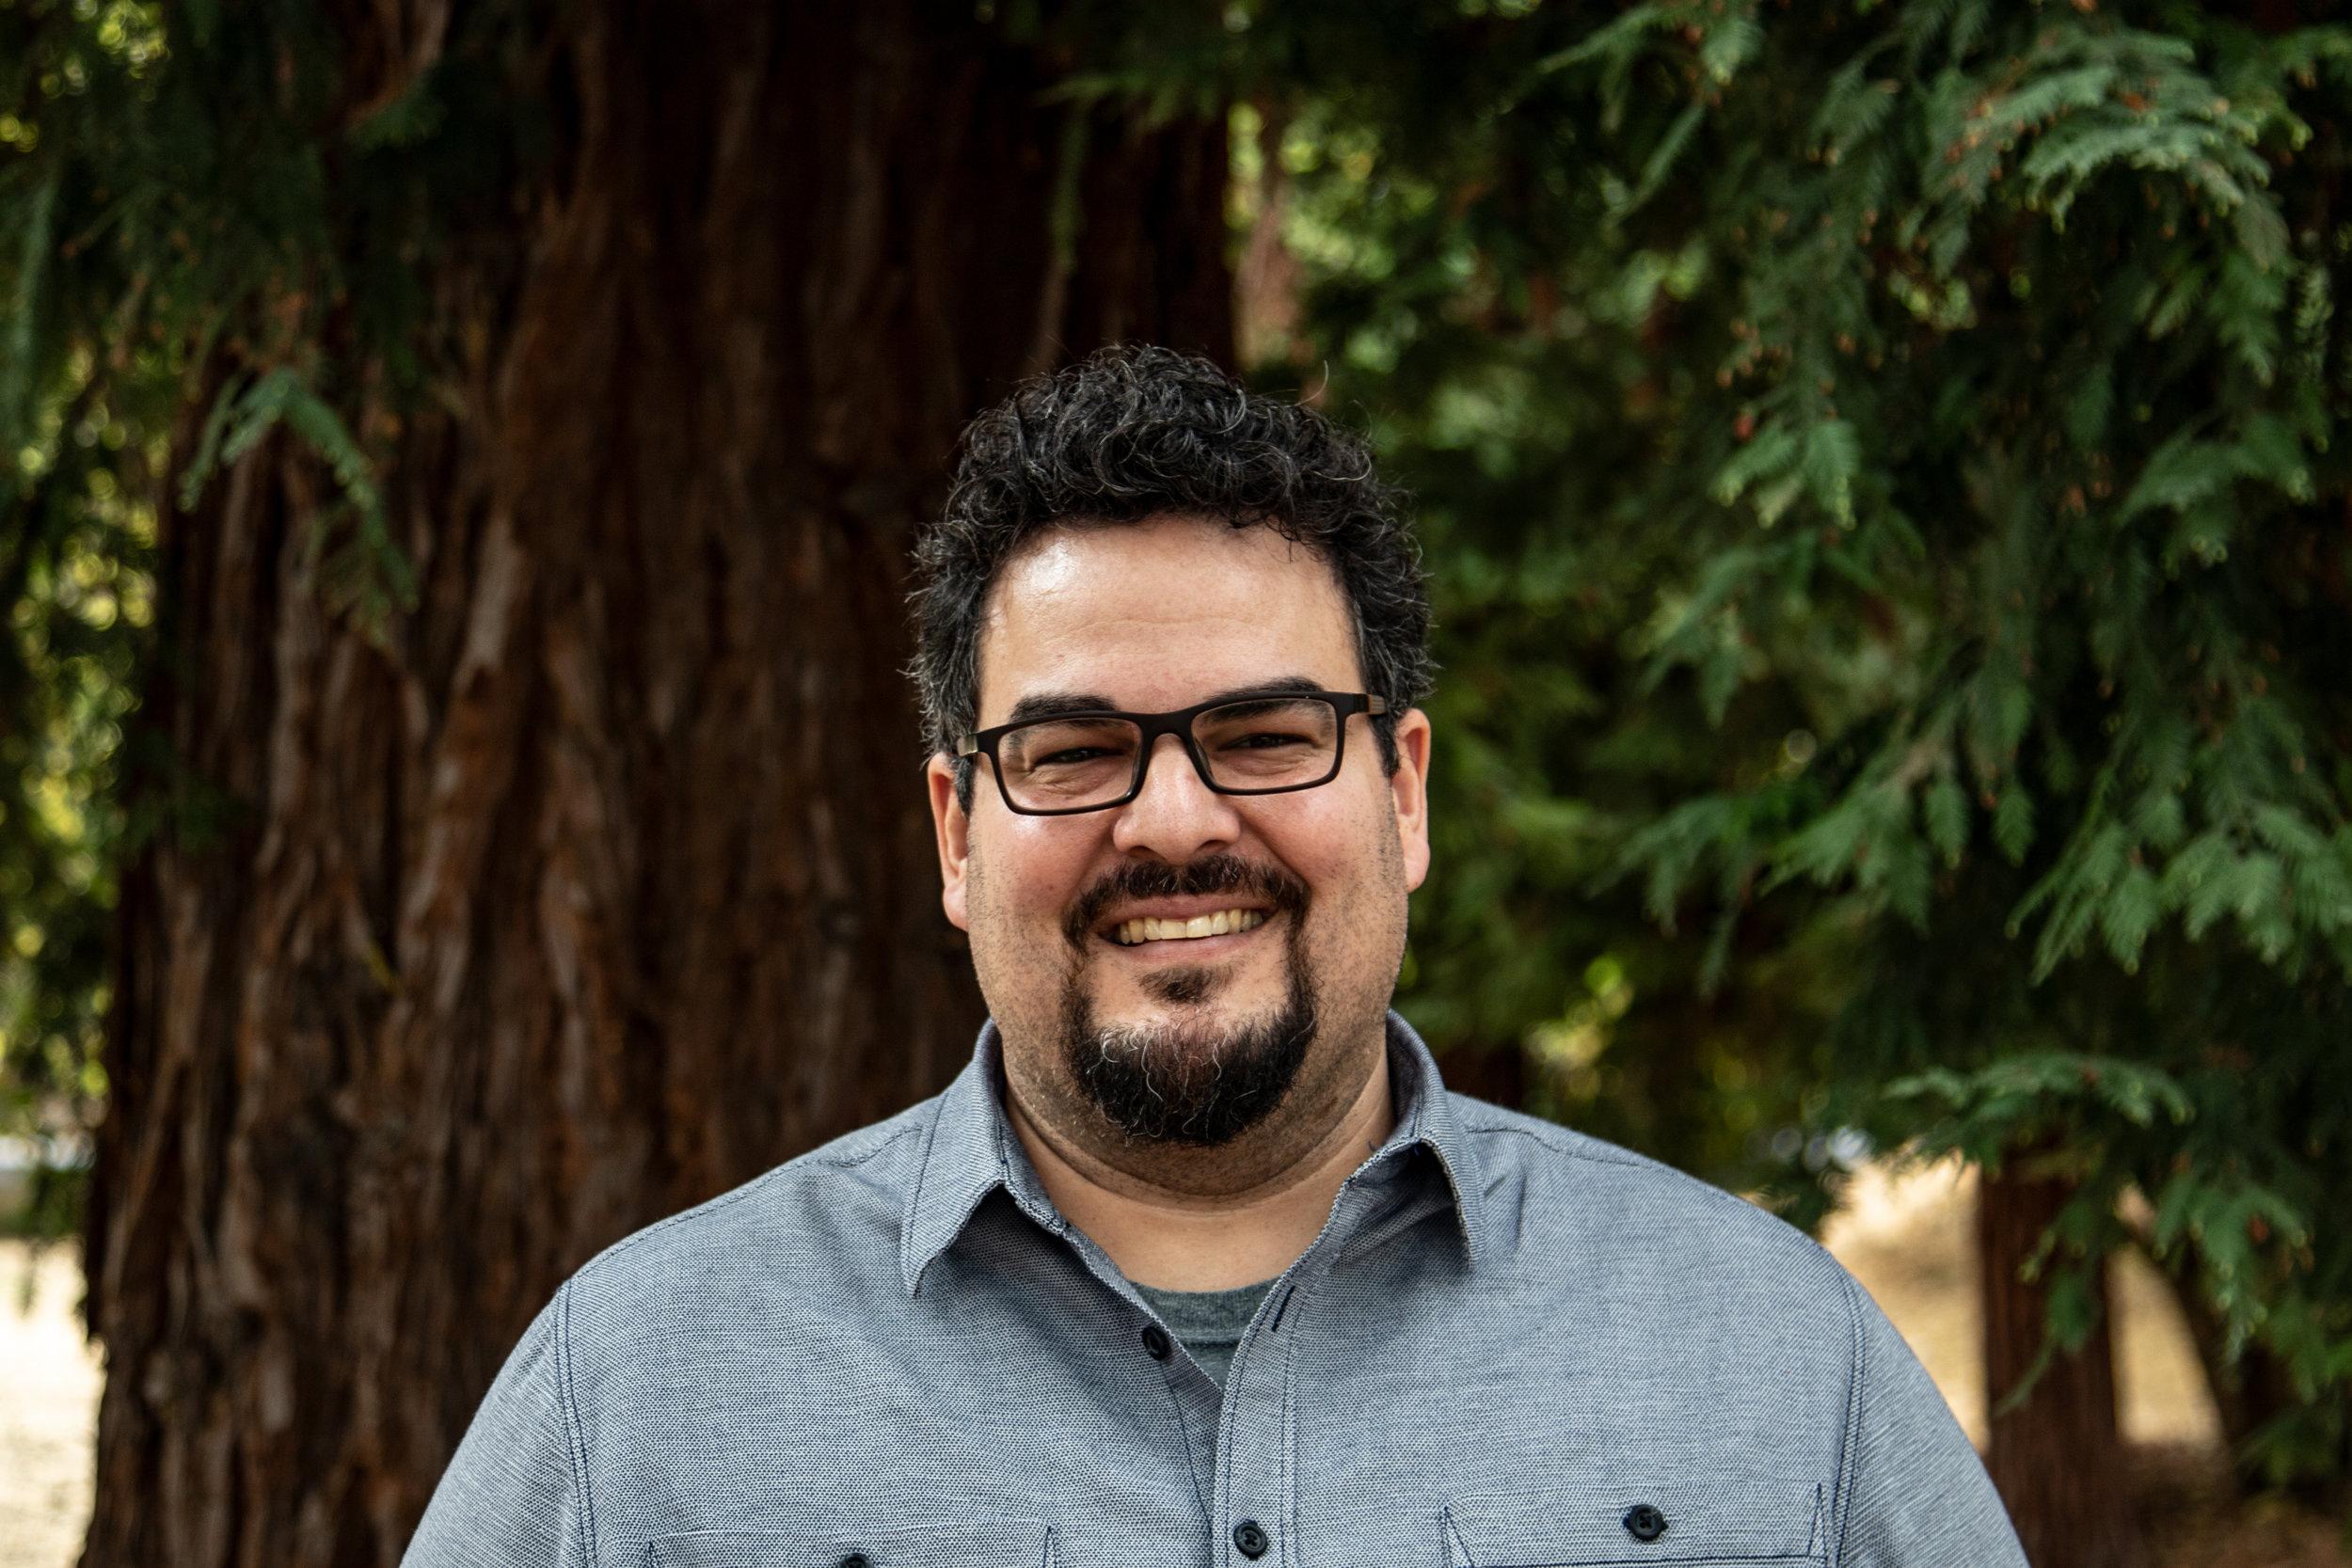 TimBrady - Associate Pastor